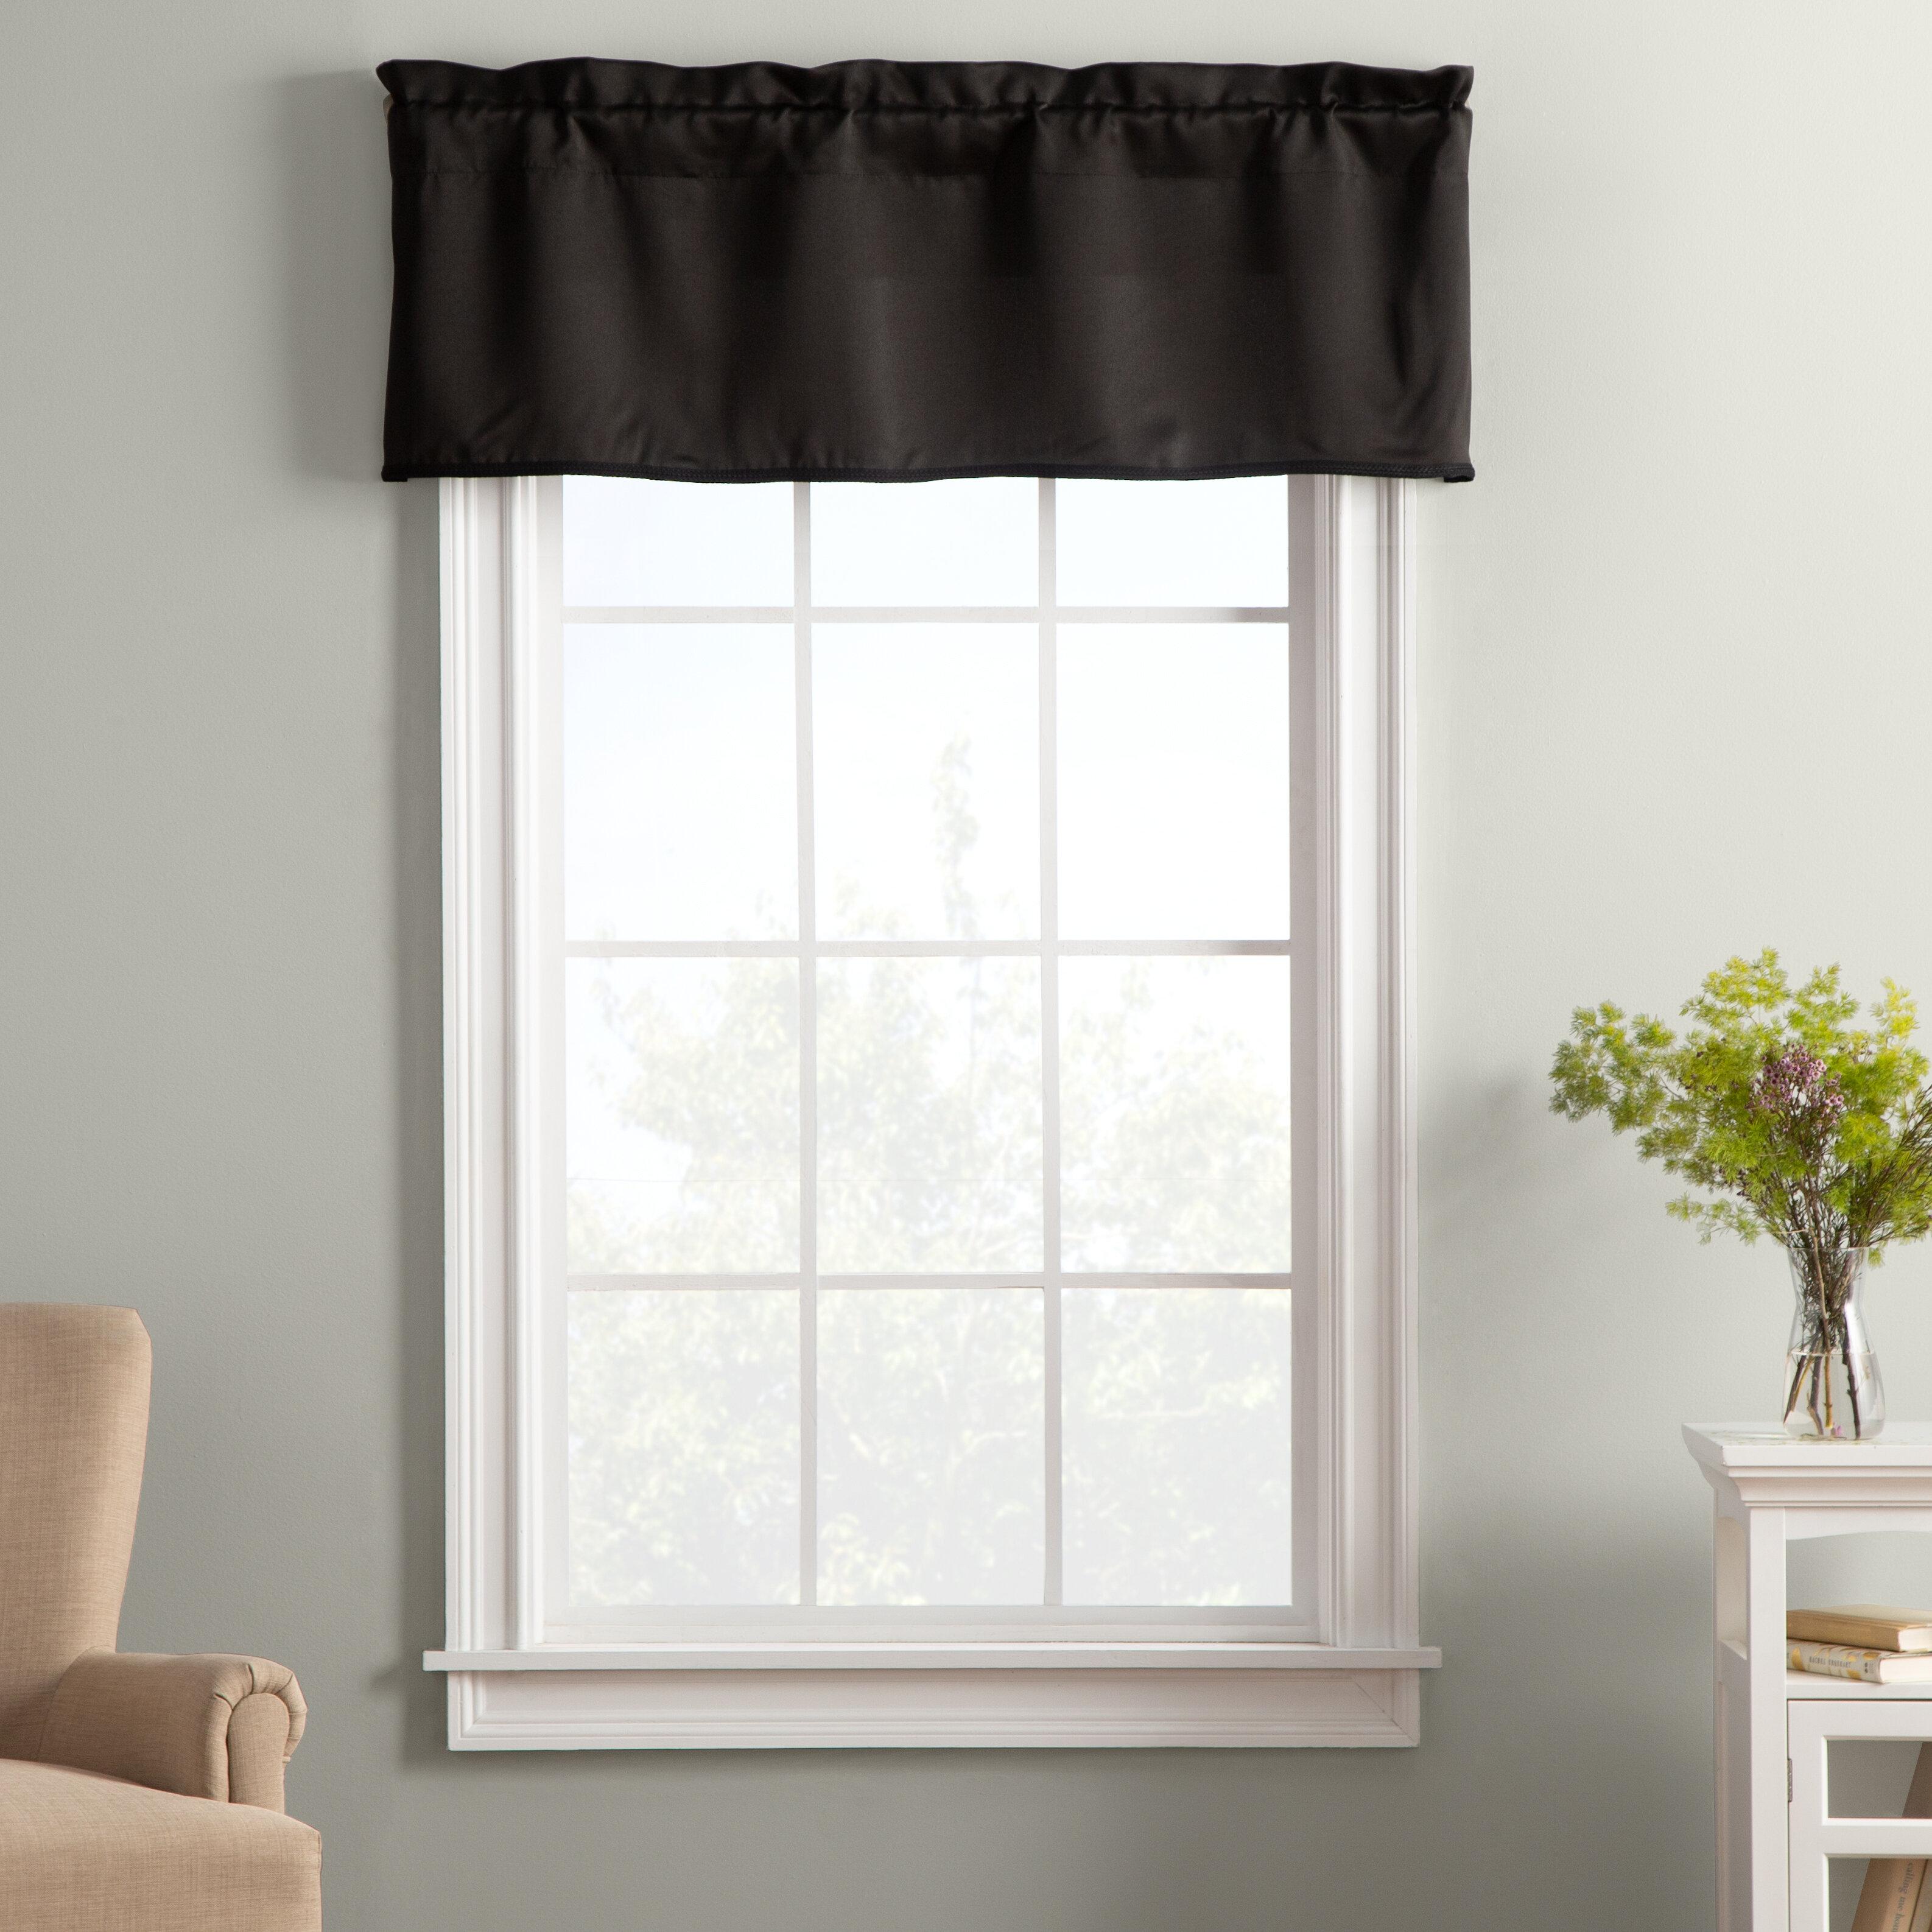 Curtain Window Valances You Ll Love In 2020 Wayfair